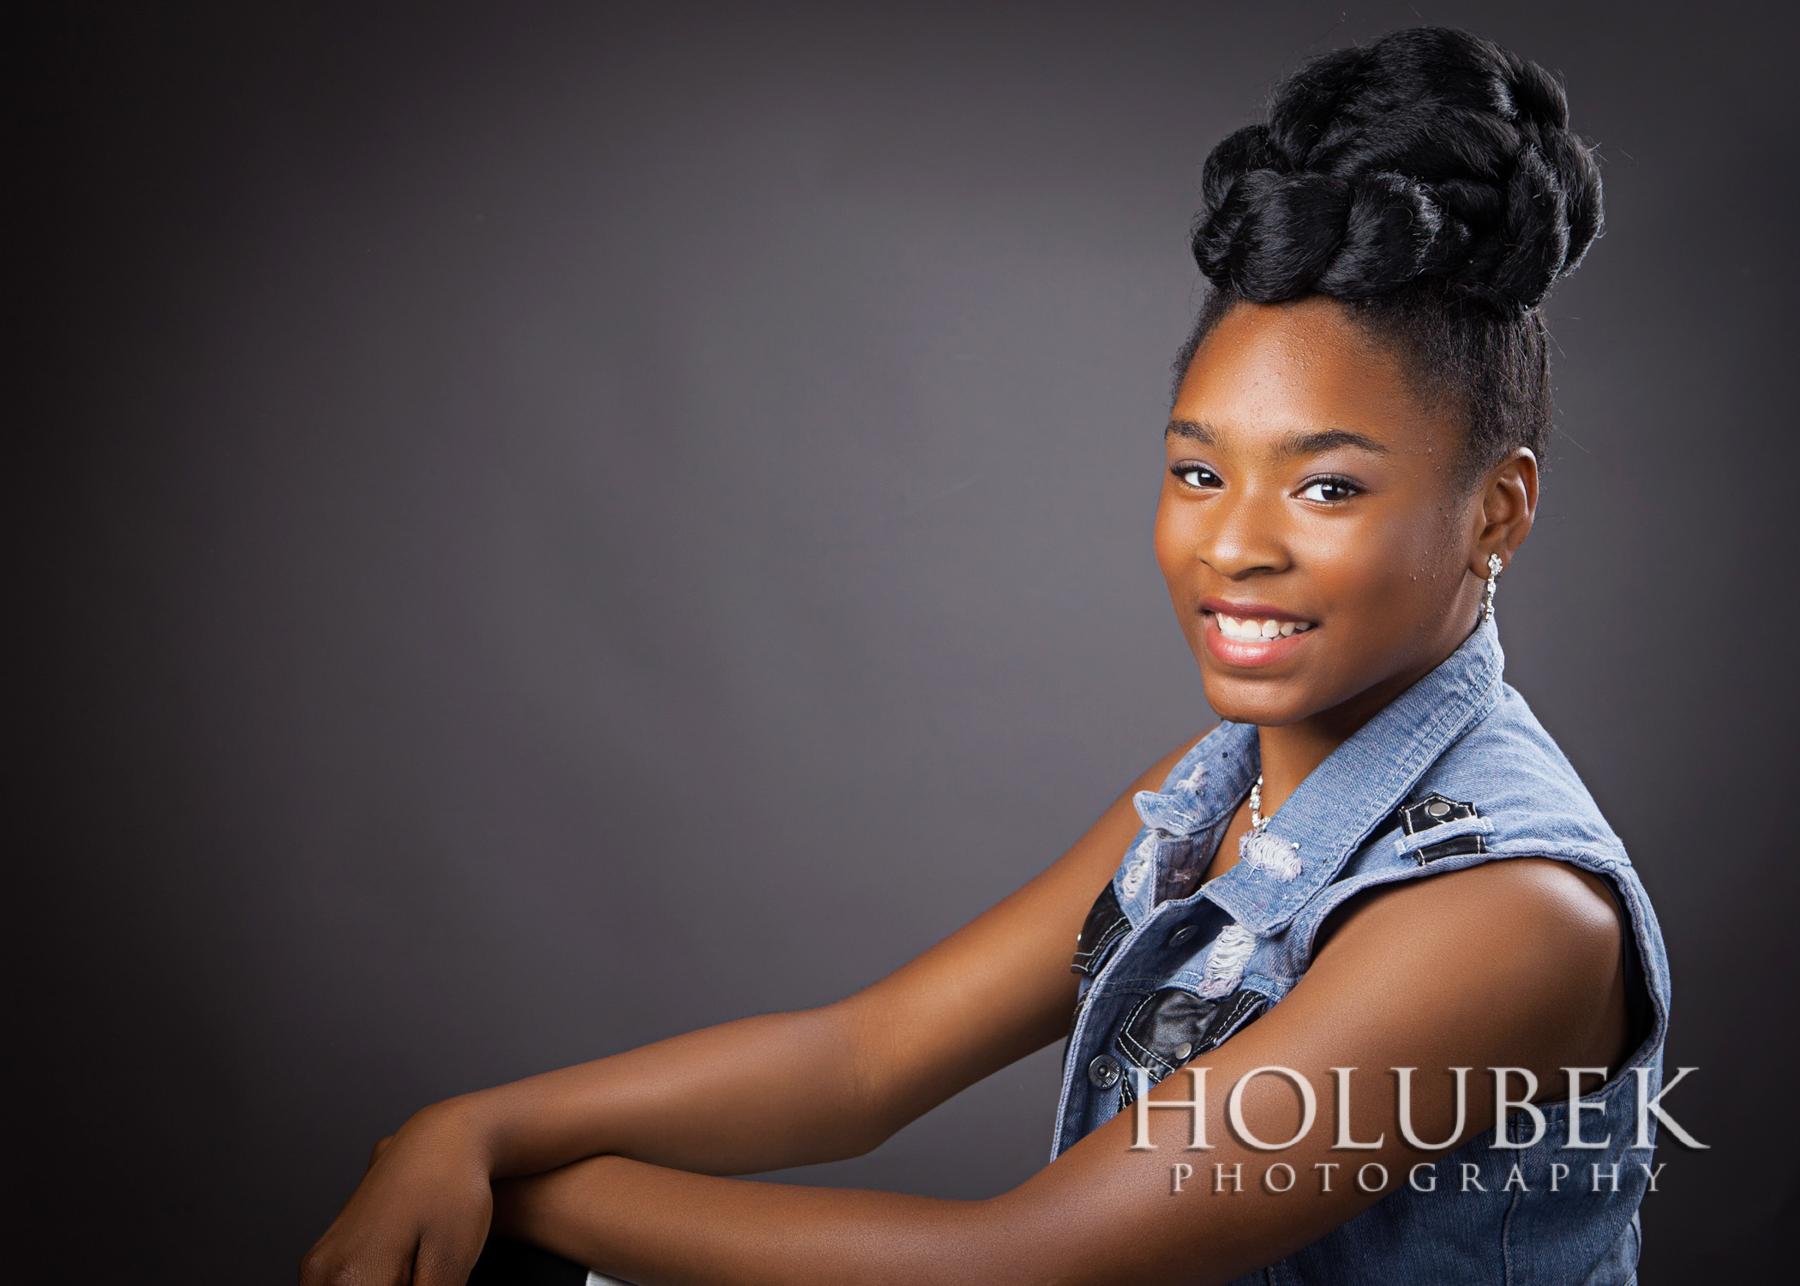 young teen photo shoot